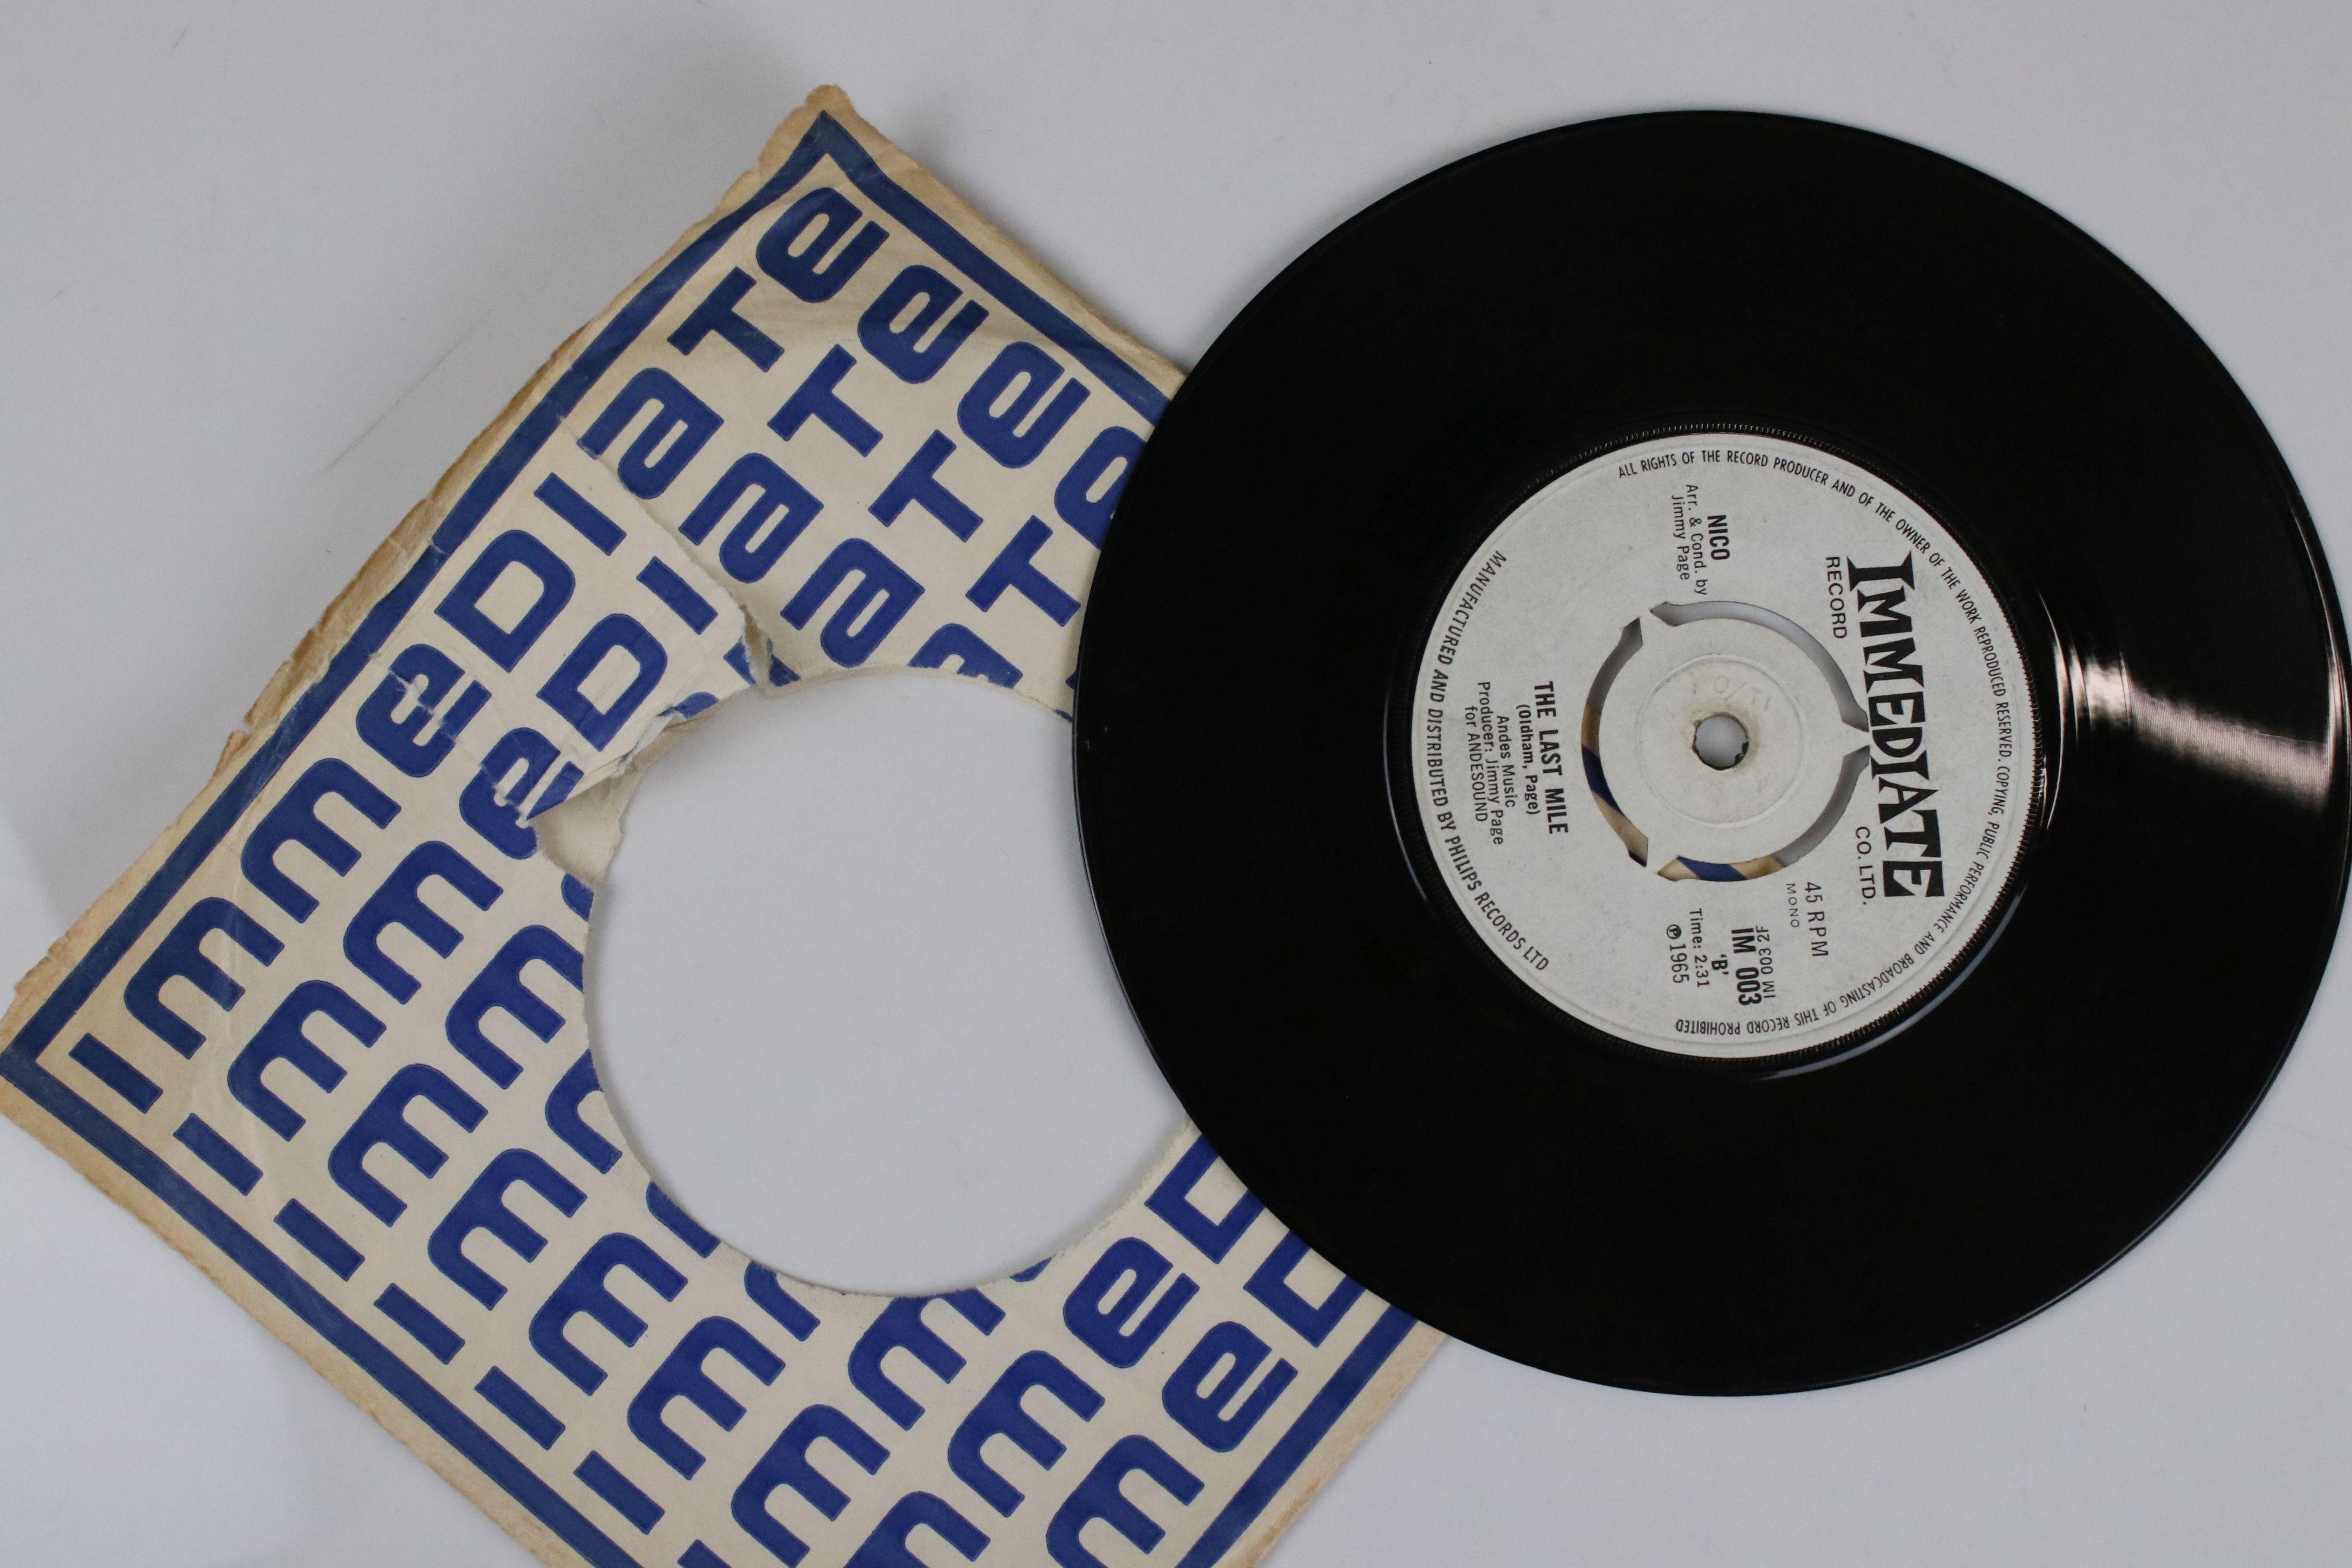 Vinyl - Nico I'm Not Sayin / The Last Mile 45 on Immediate IM003 in company sleeve, vg - Image 5 of 5